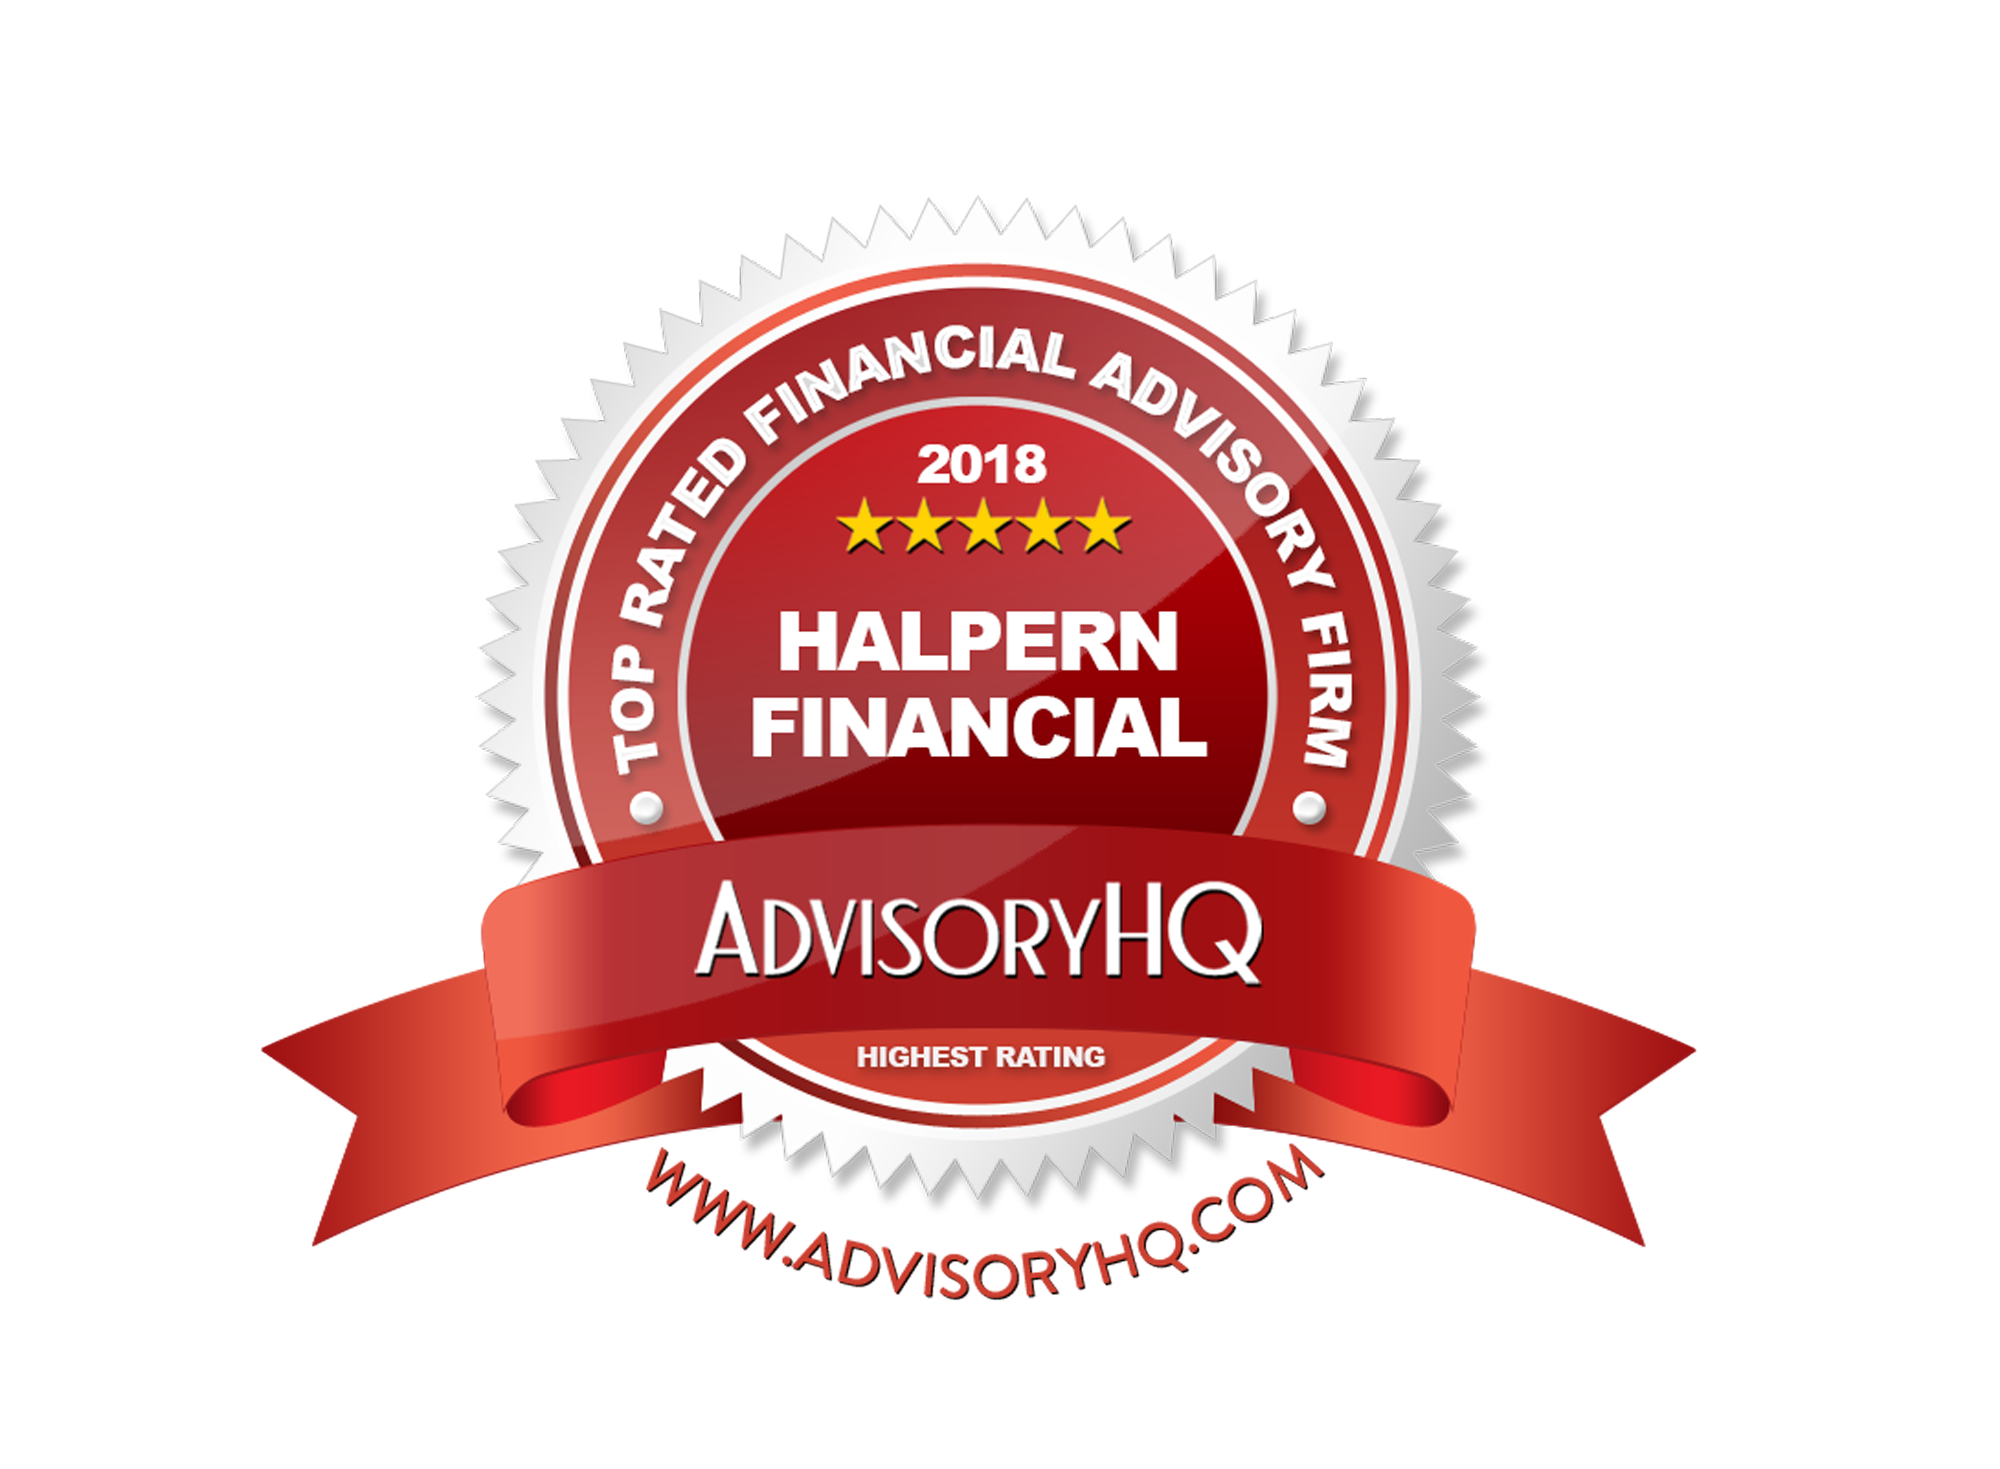 Halpern Financial Named a Top 10 Financial Advisor in D.C., Maryland and Virginia Region Thumbnail